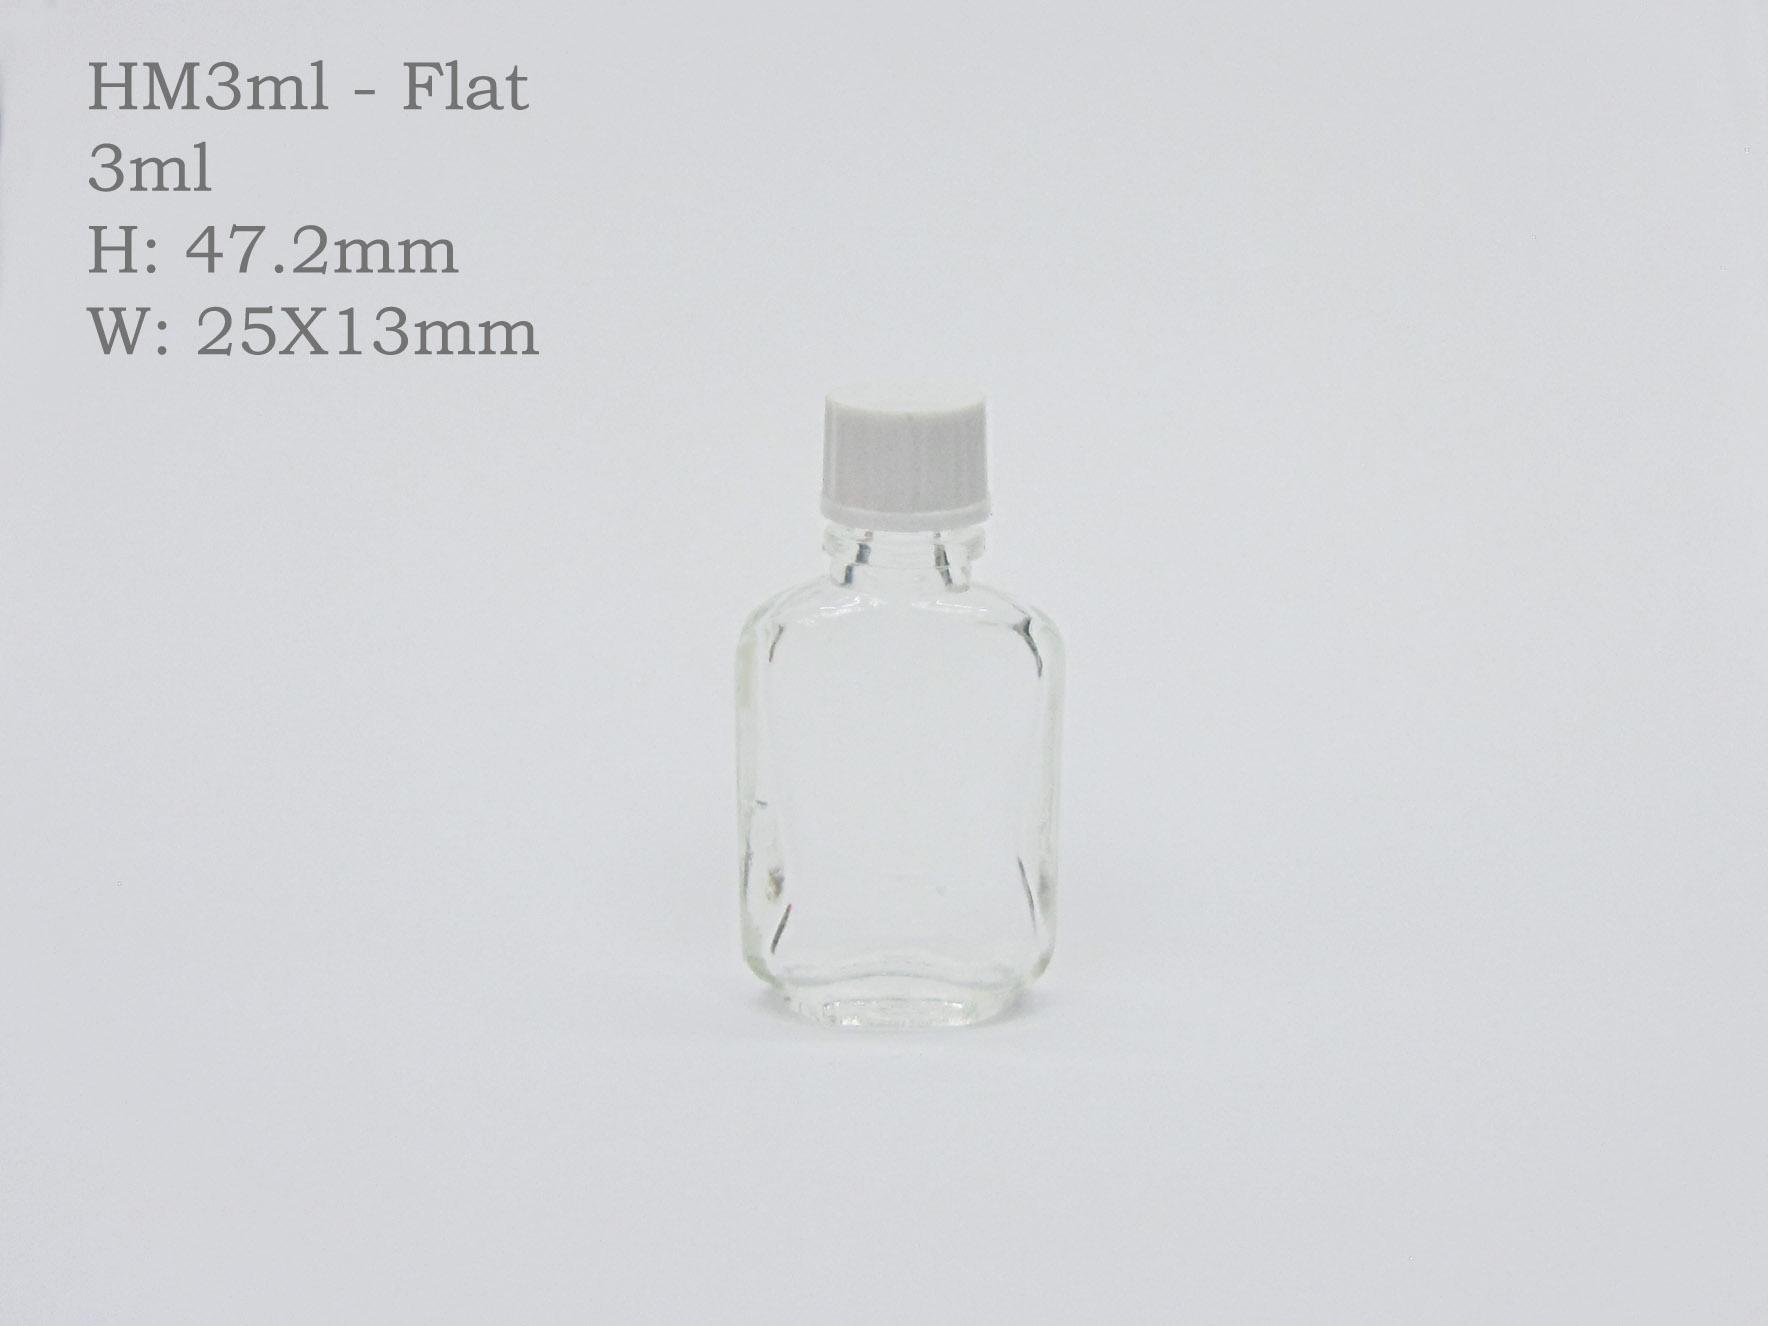 HM3ml_Flat_medic_4fe411d017837